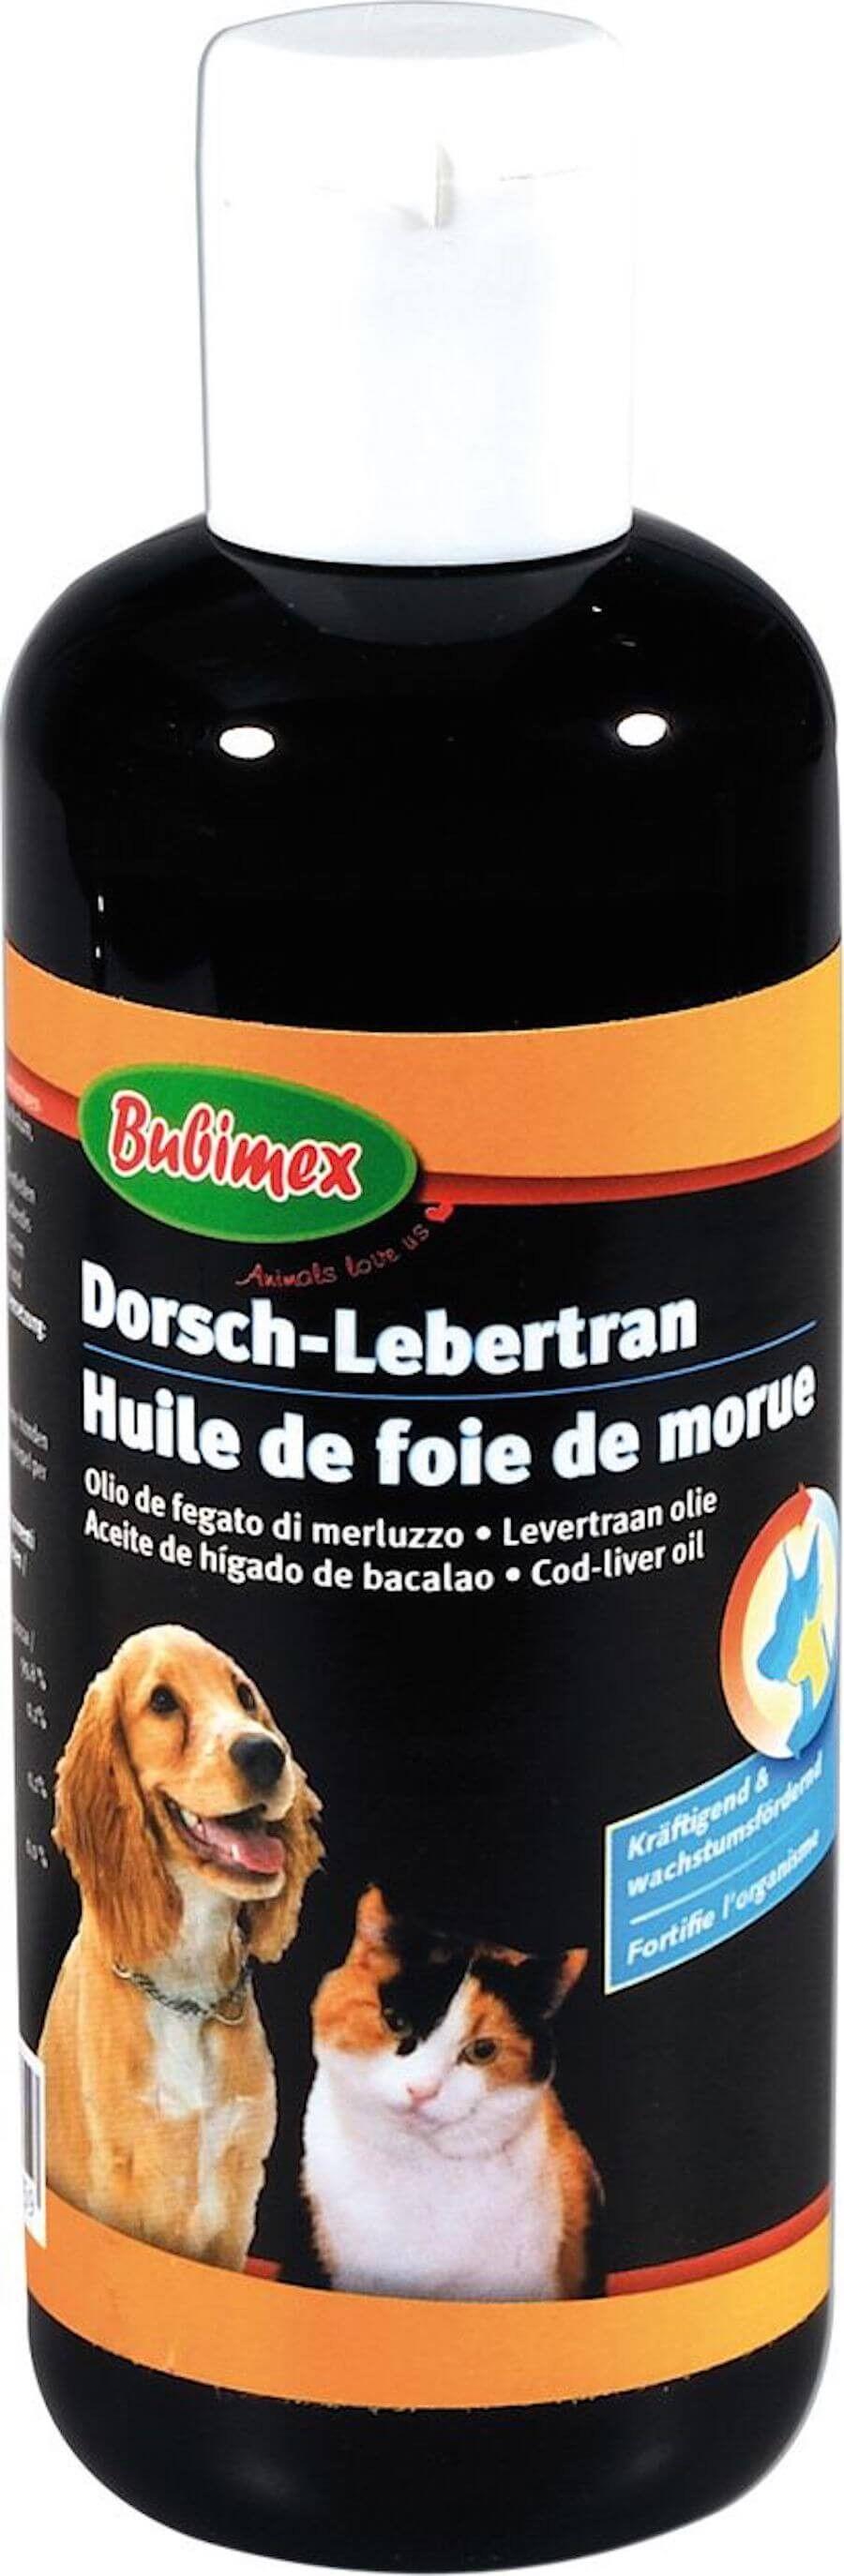 Bubimex Huile de foie de morue 250 ml